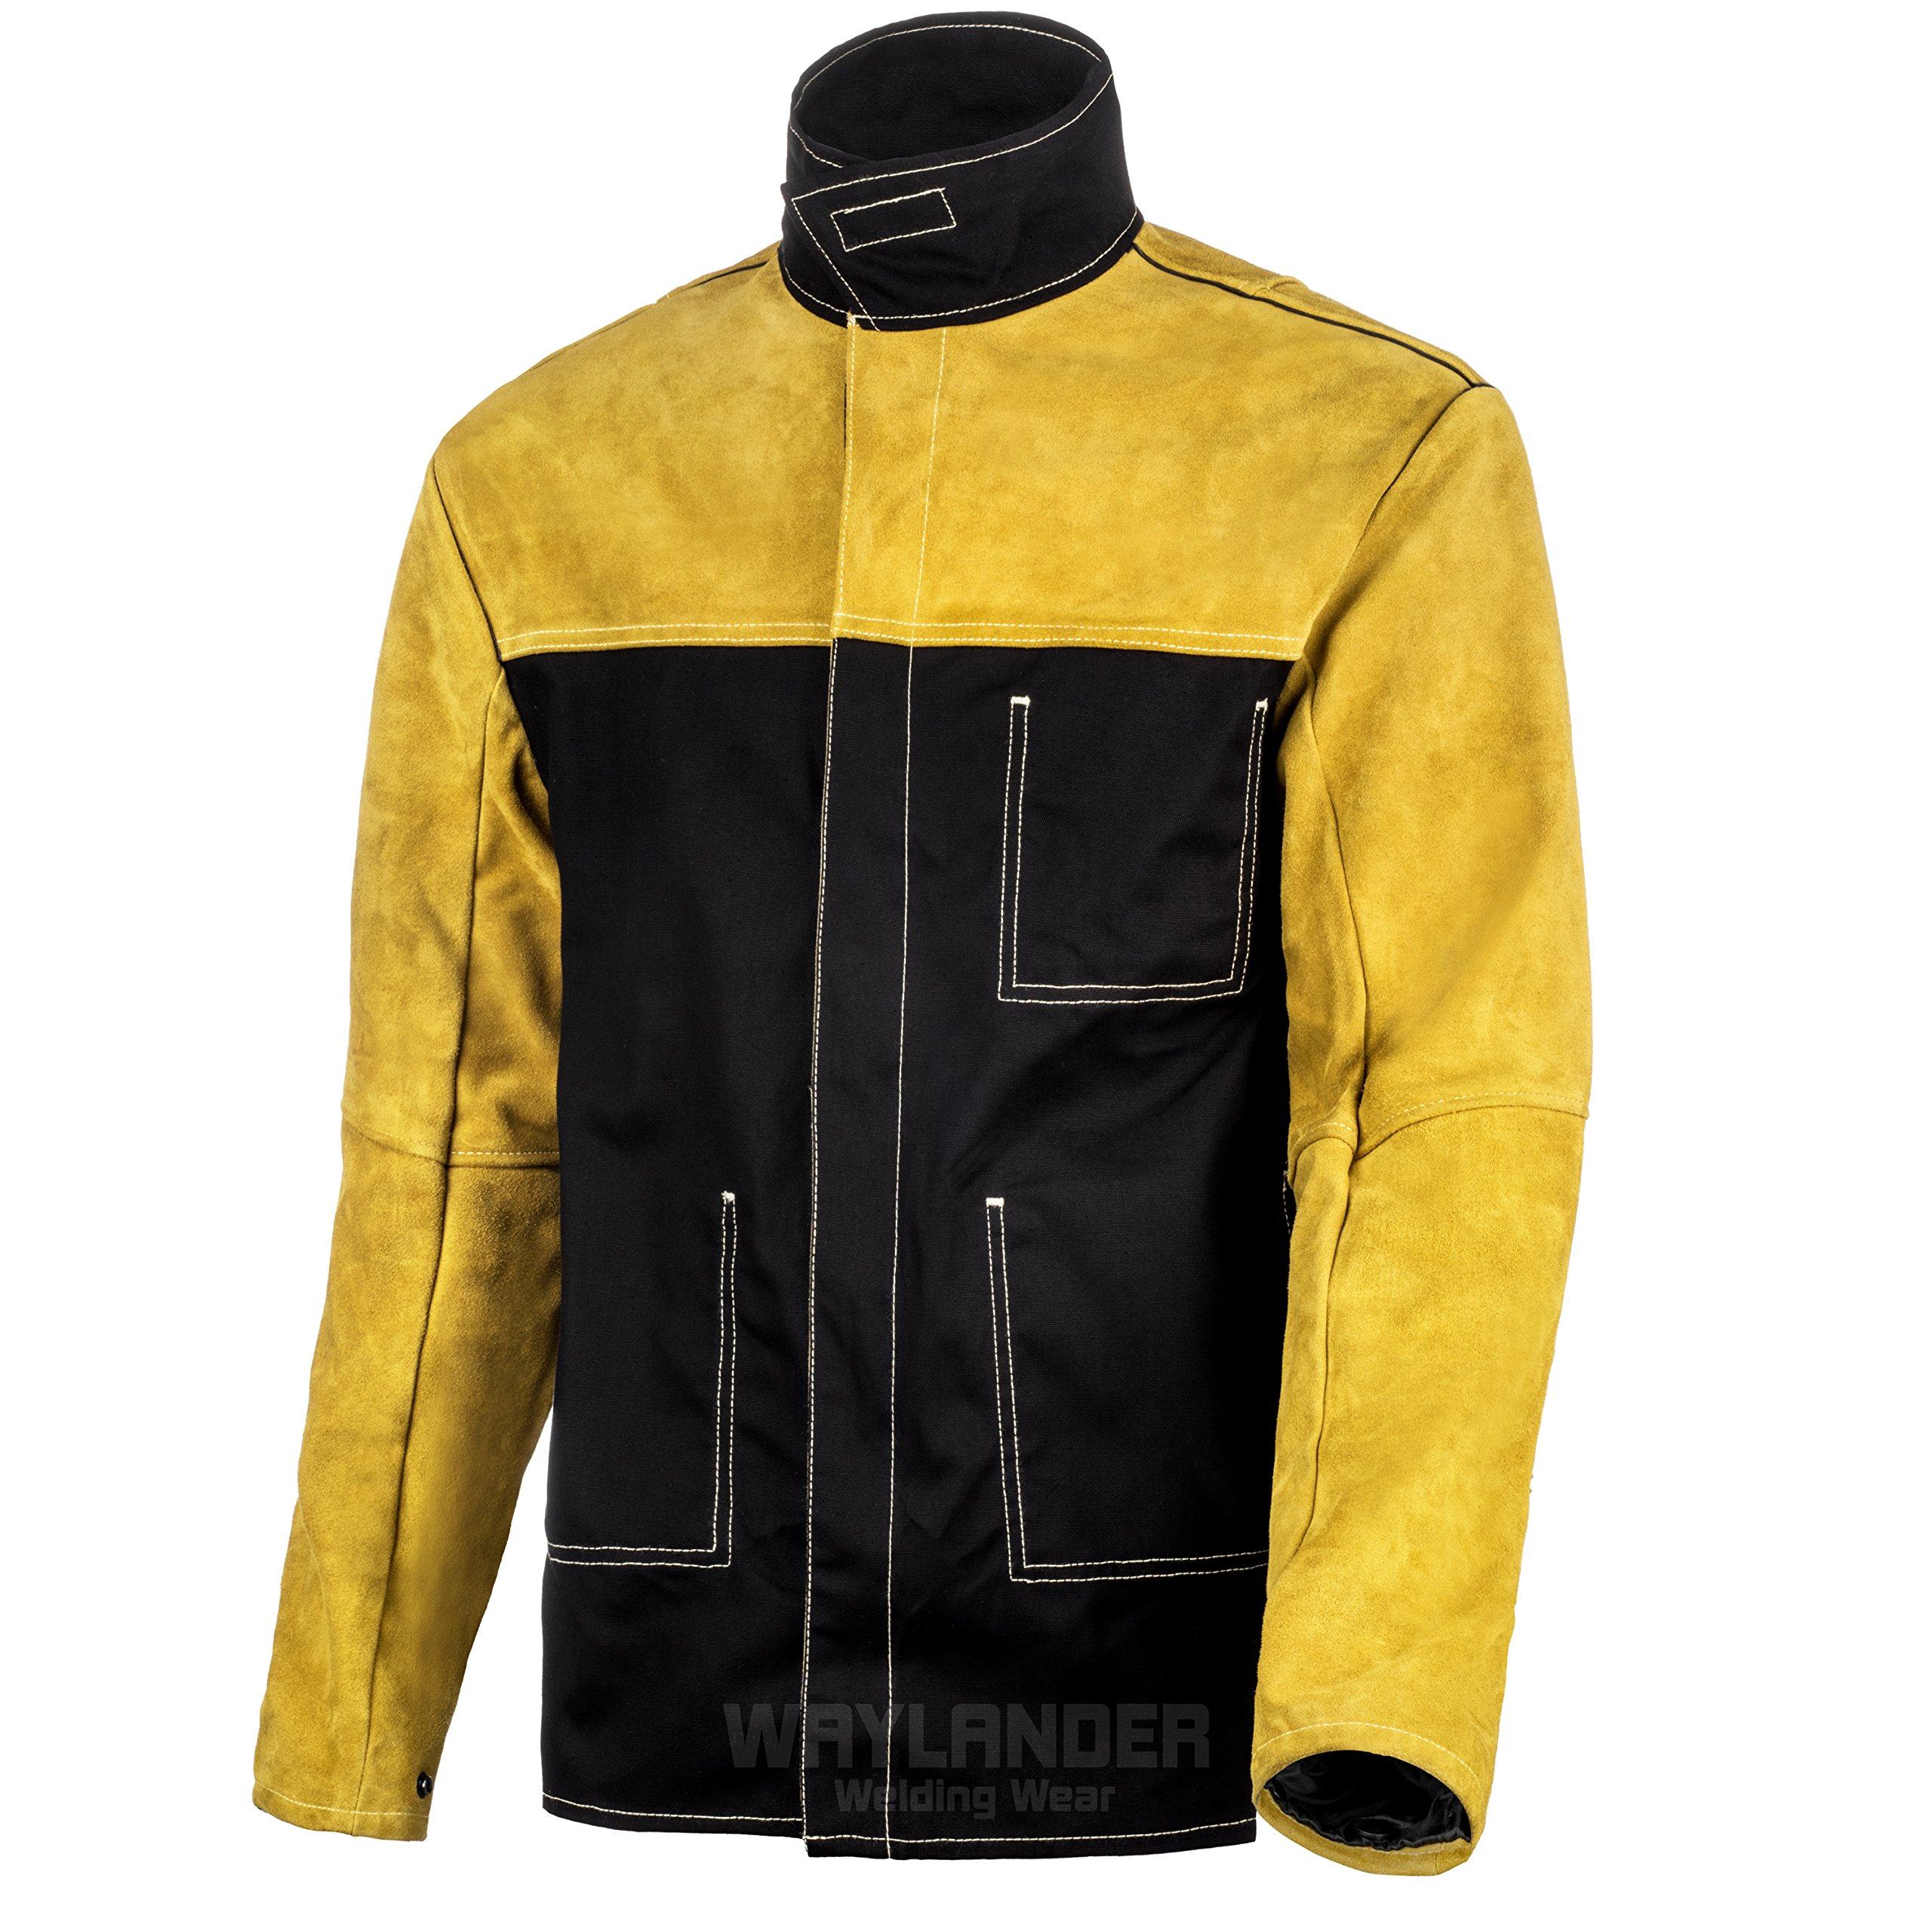 Waylander Welding Jacket XL Split Leather Heat Fire Resistant Cotton Kevlar Stitched Cowhide - XL